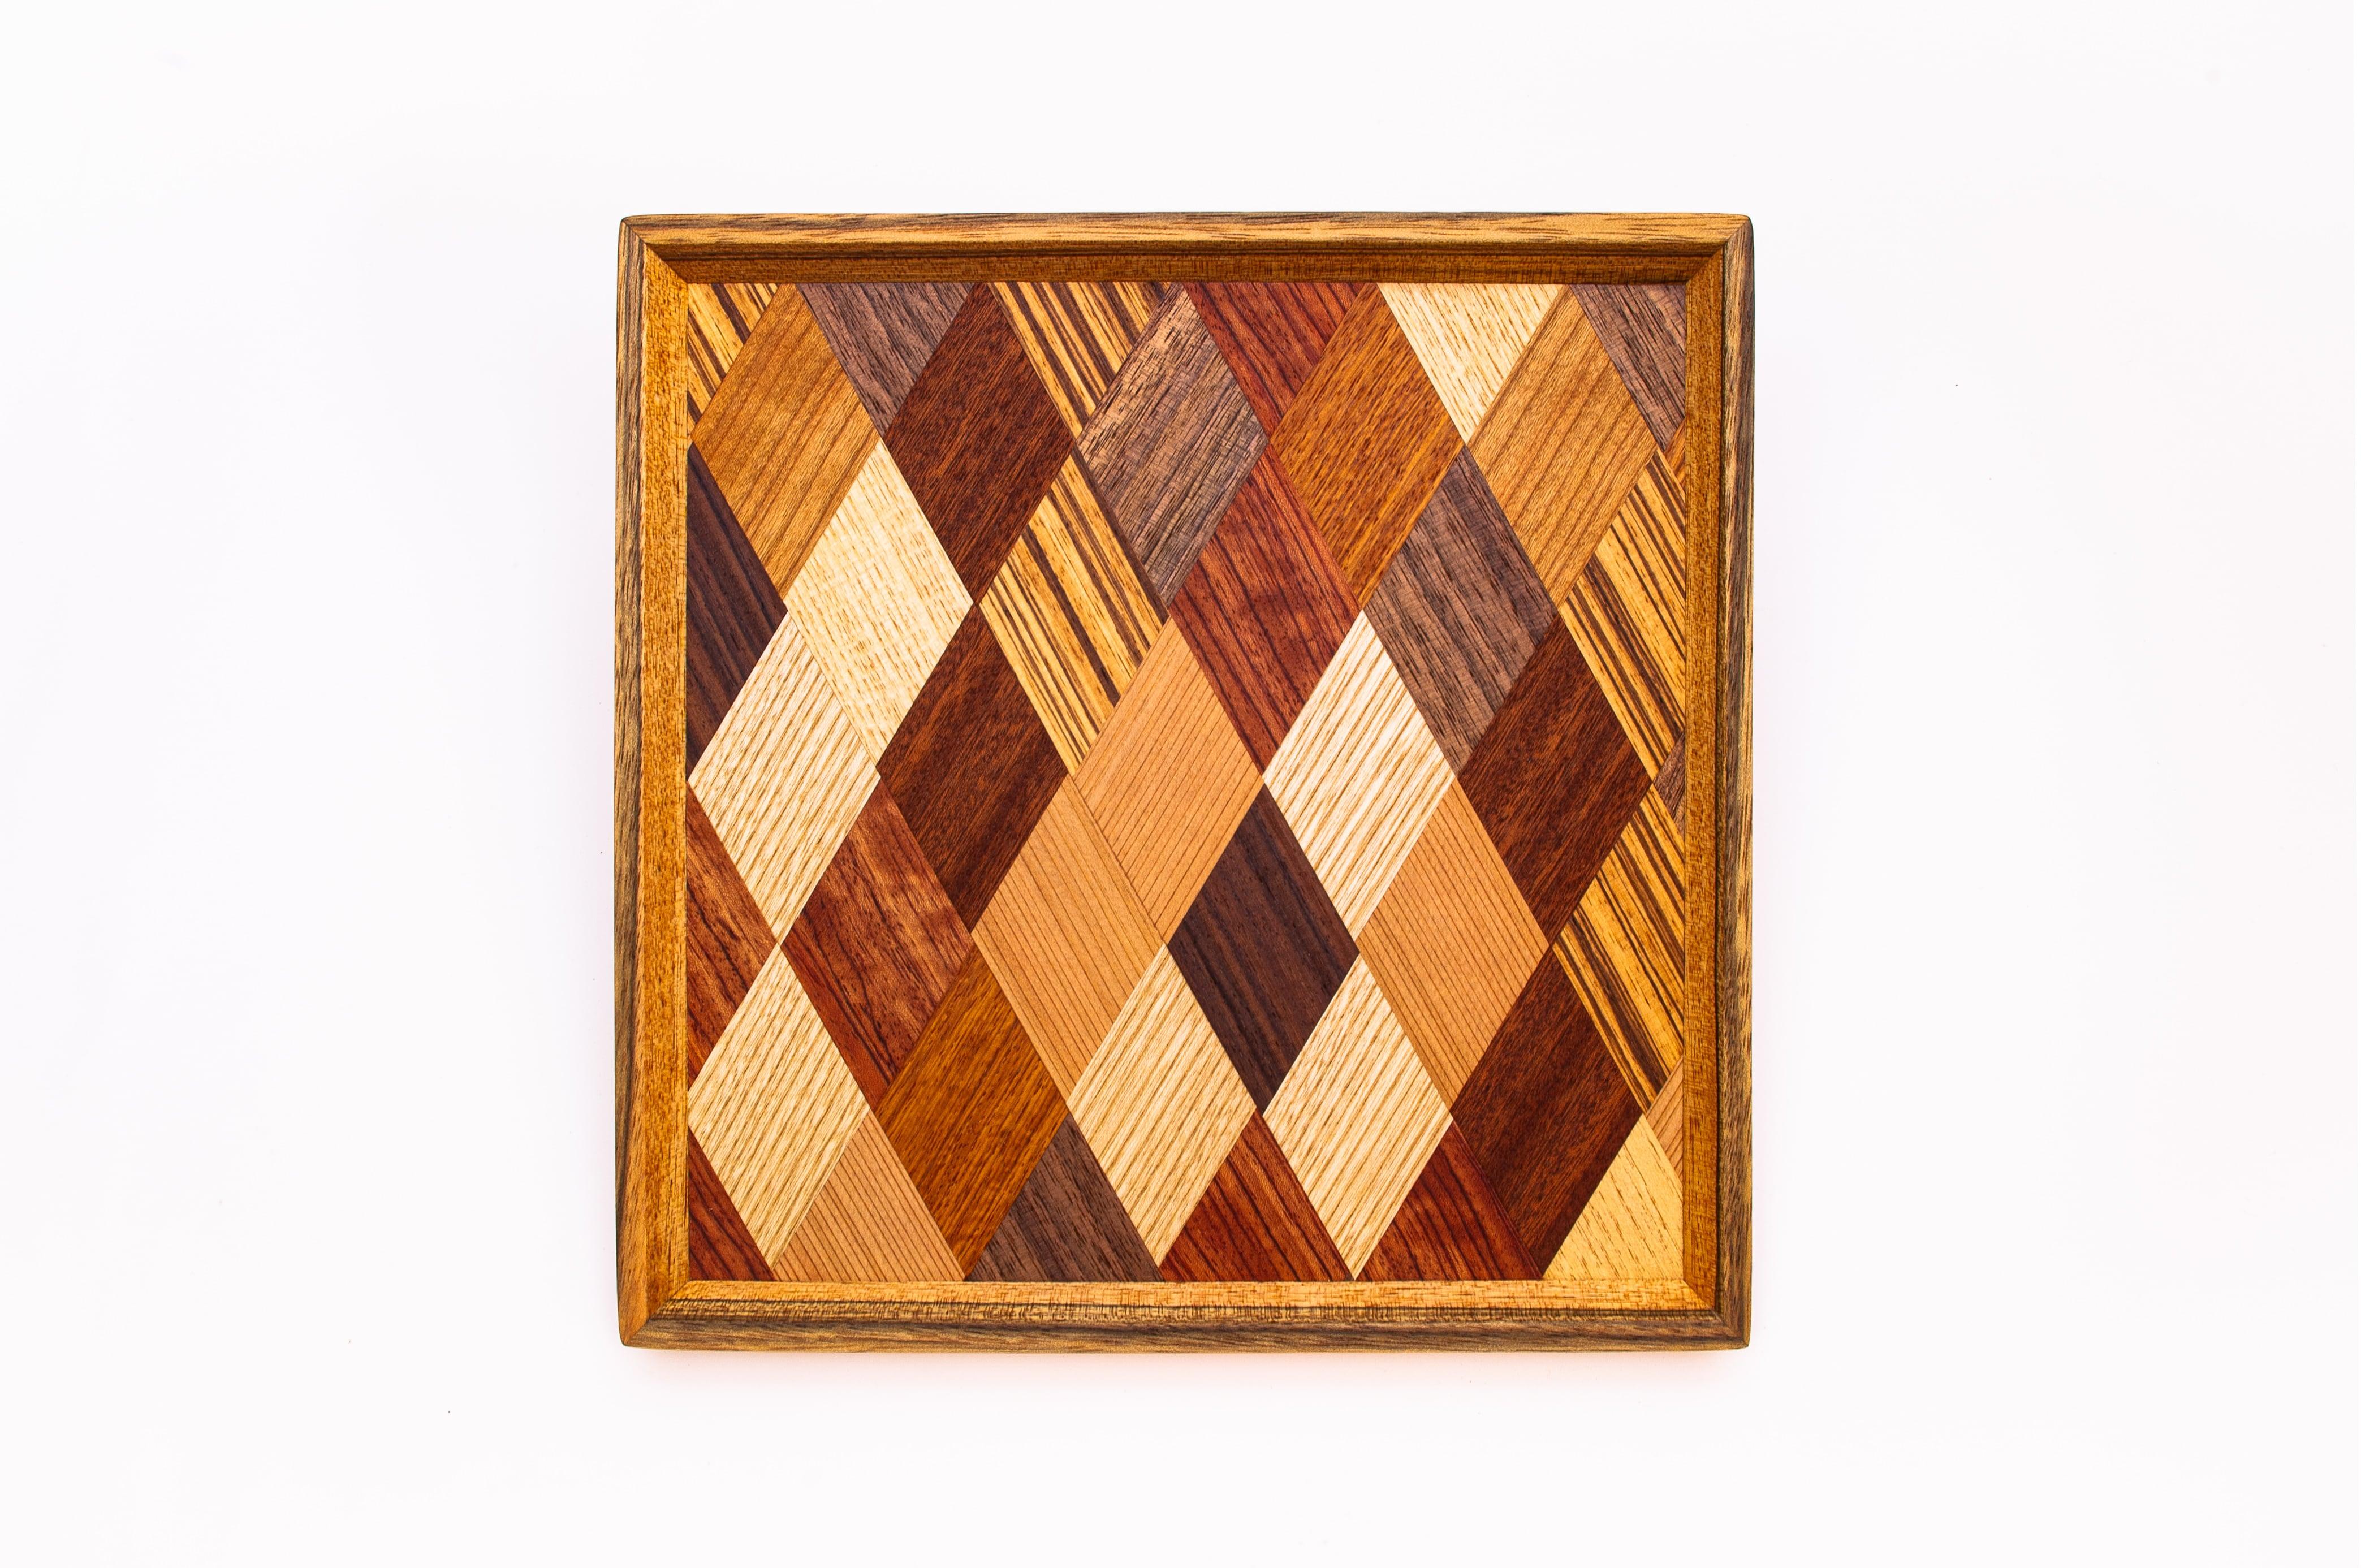 菱形模様 正方形のトレー 0321